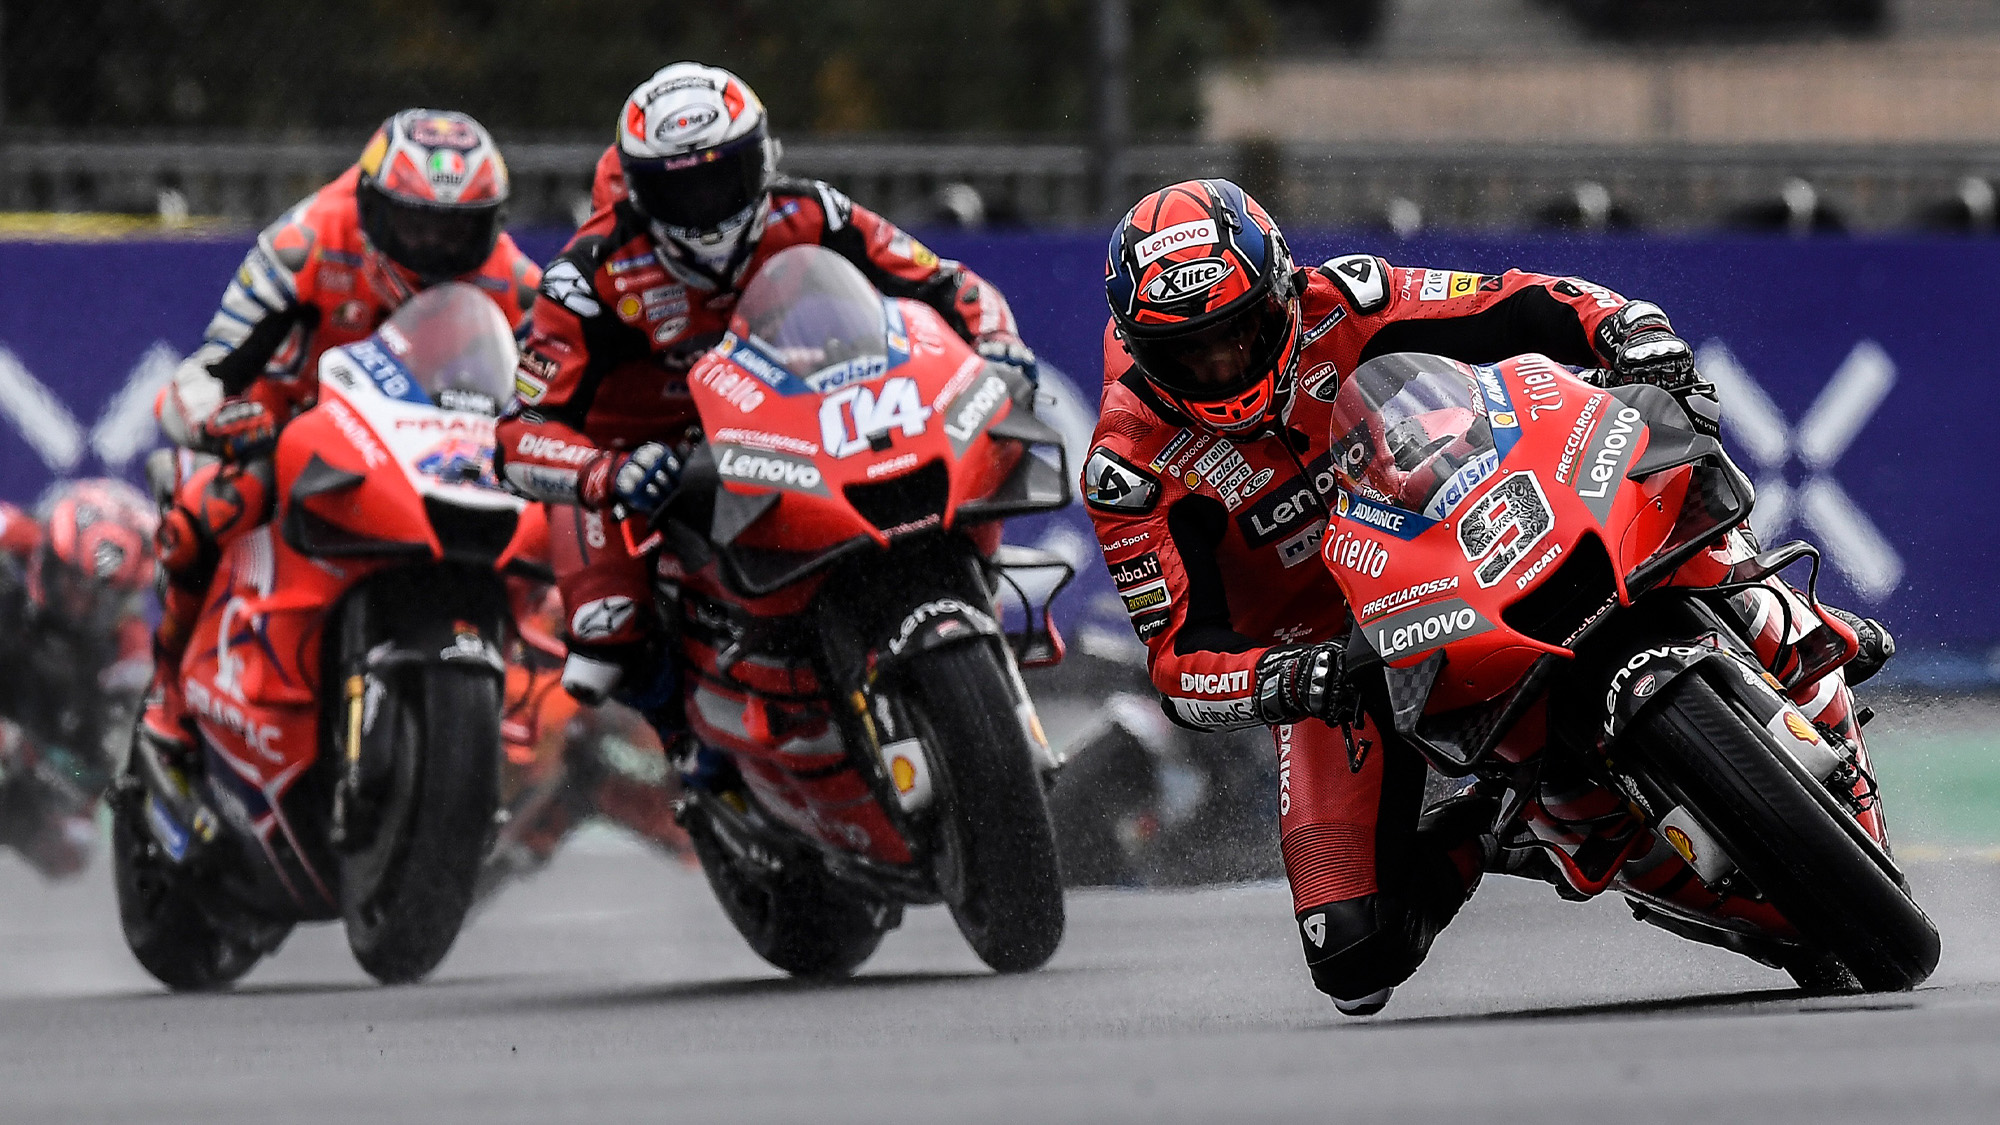 Why MotoGP's V4s dominated rain-lashed Le Mans